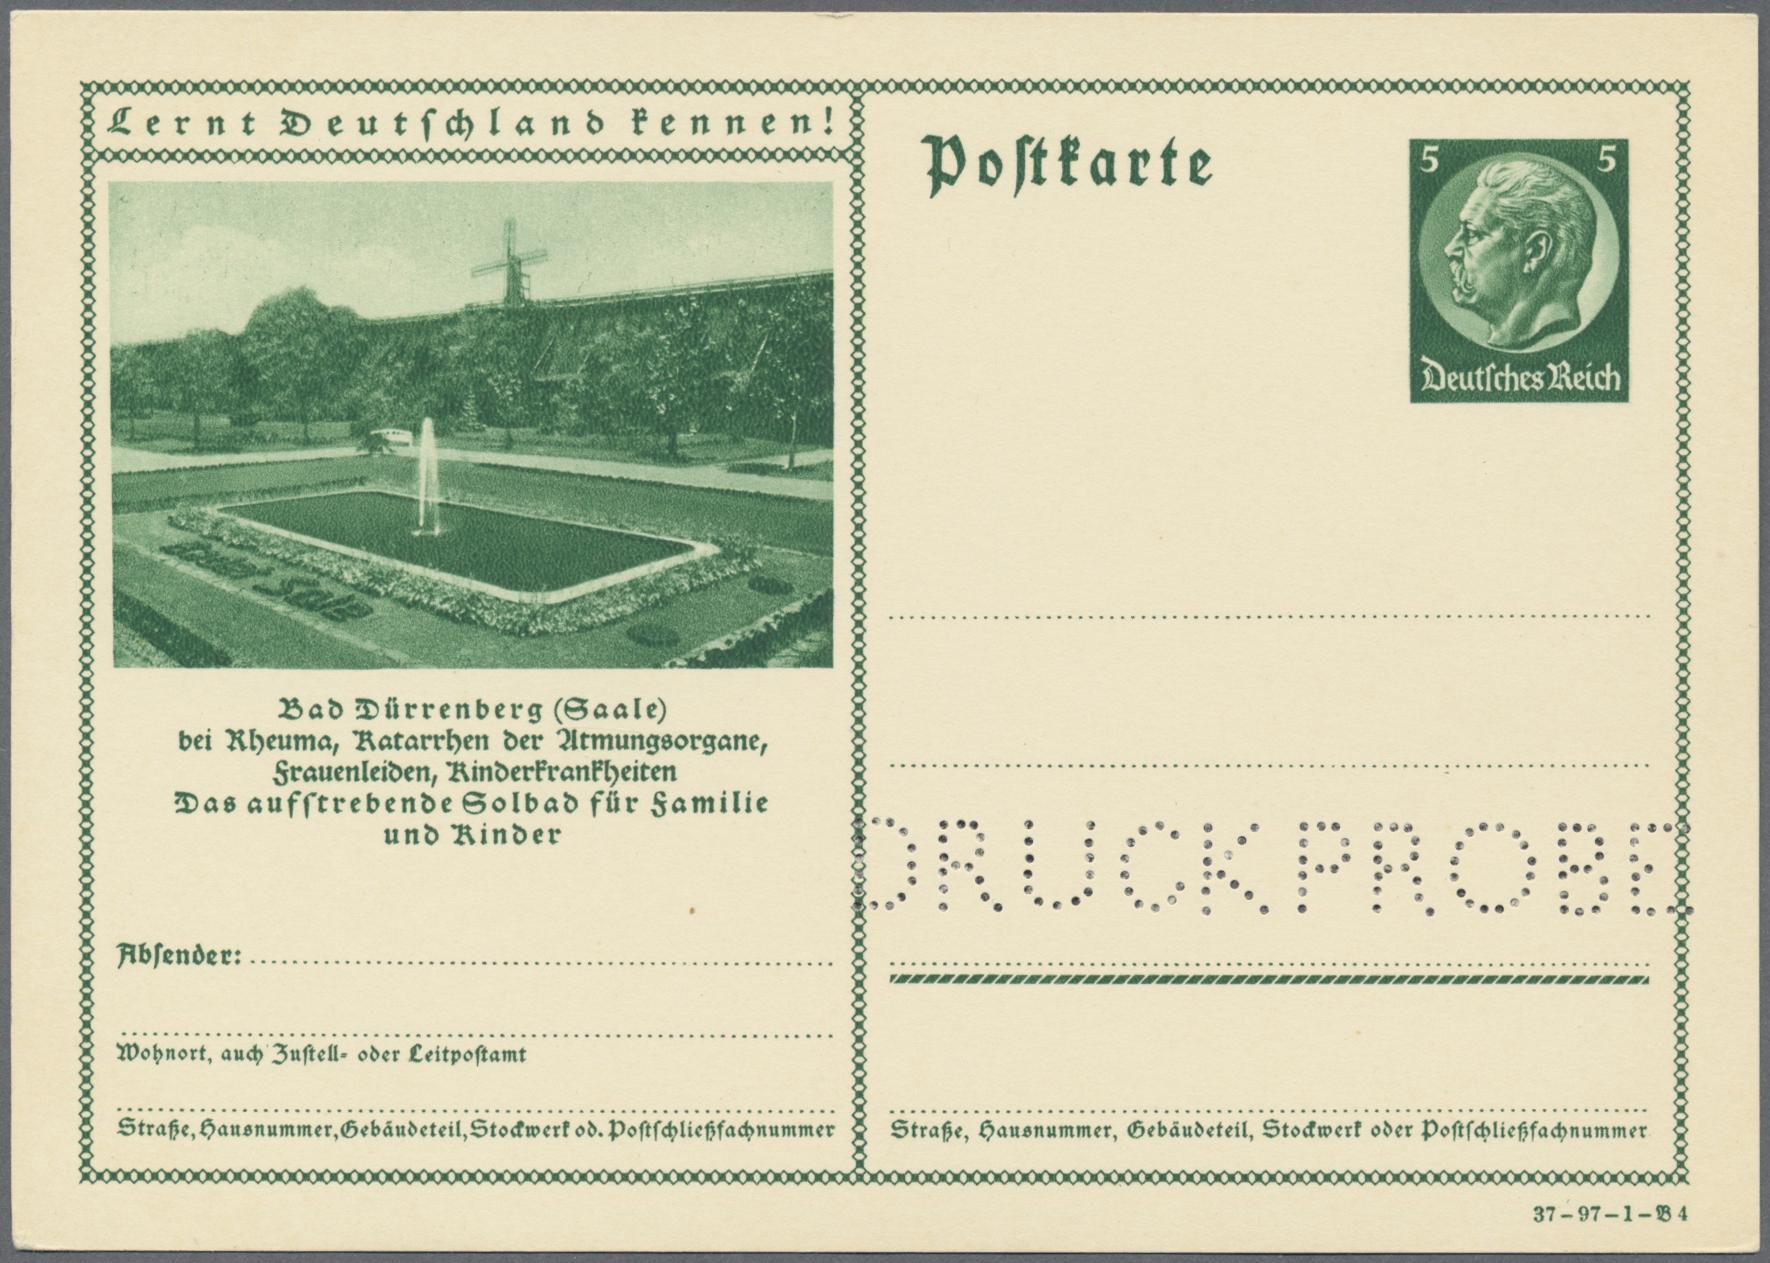 Lot 28729 - Deutsches Reich - Ganzsachen  -  Auktionshaus Christoph Gärtner GmbH & Co. KG Sale #46 Gollcetions Germany - including the suplement